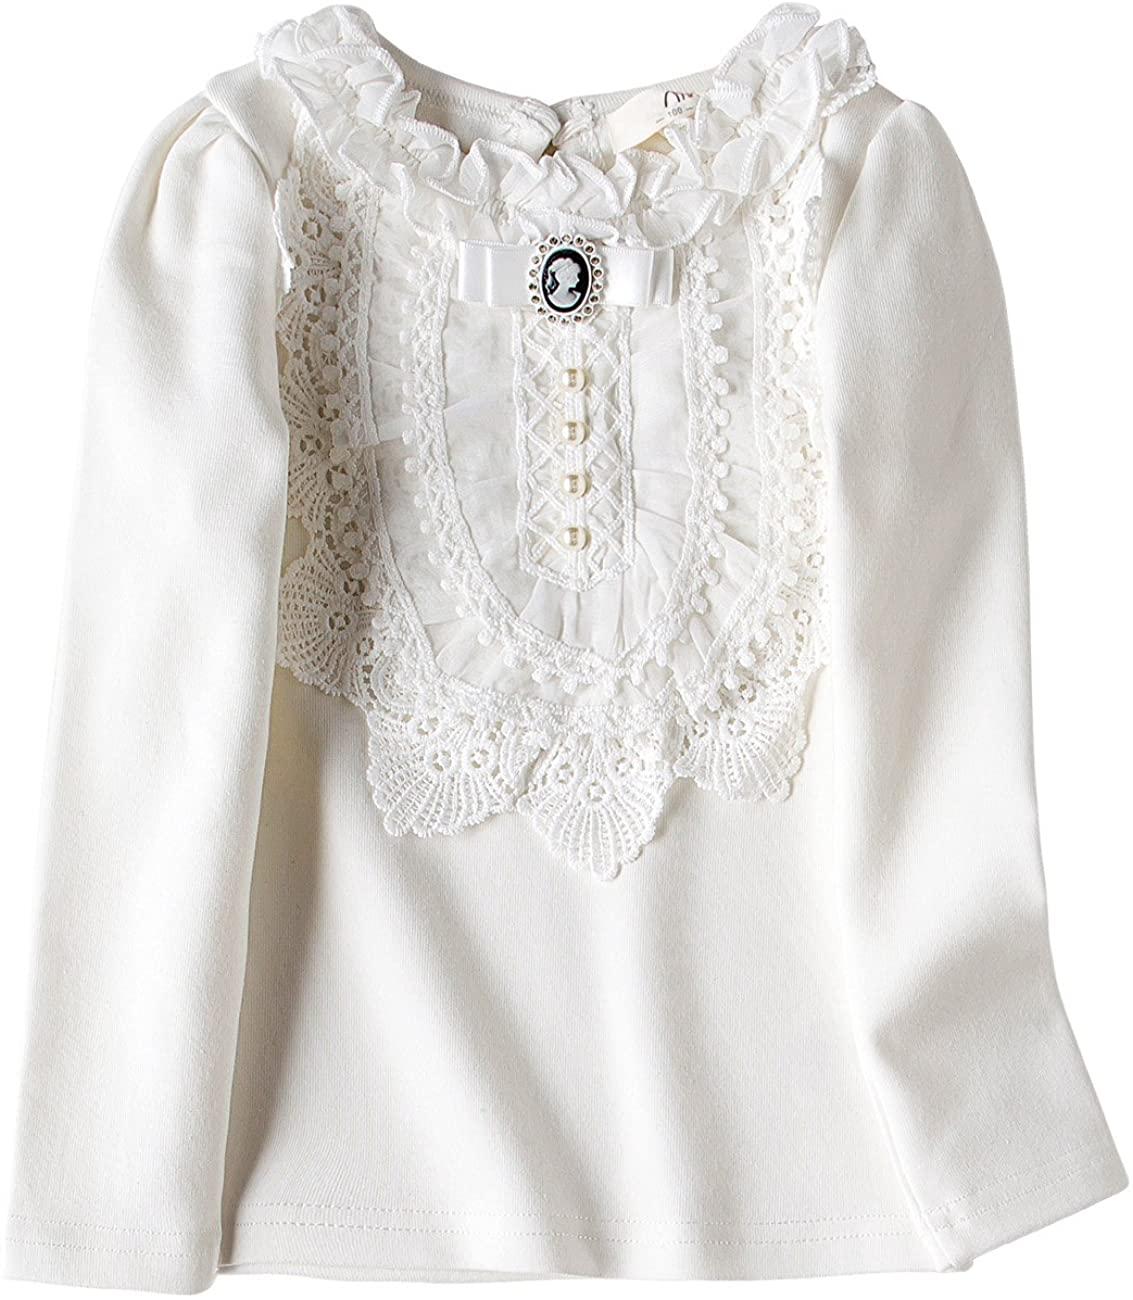 VYU Toddler Little Girls Long Sleeve Blouse 2-8 Years Kids Cotton Warm Shirts White